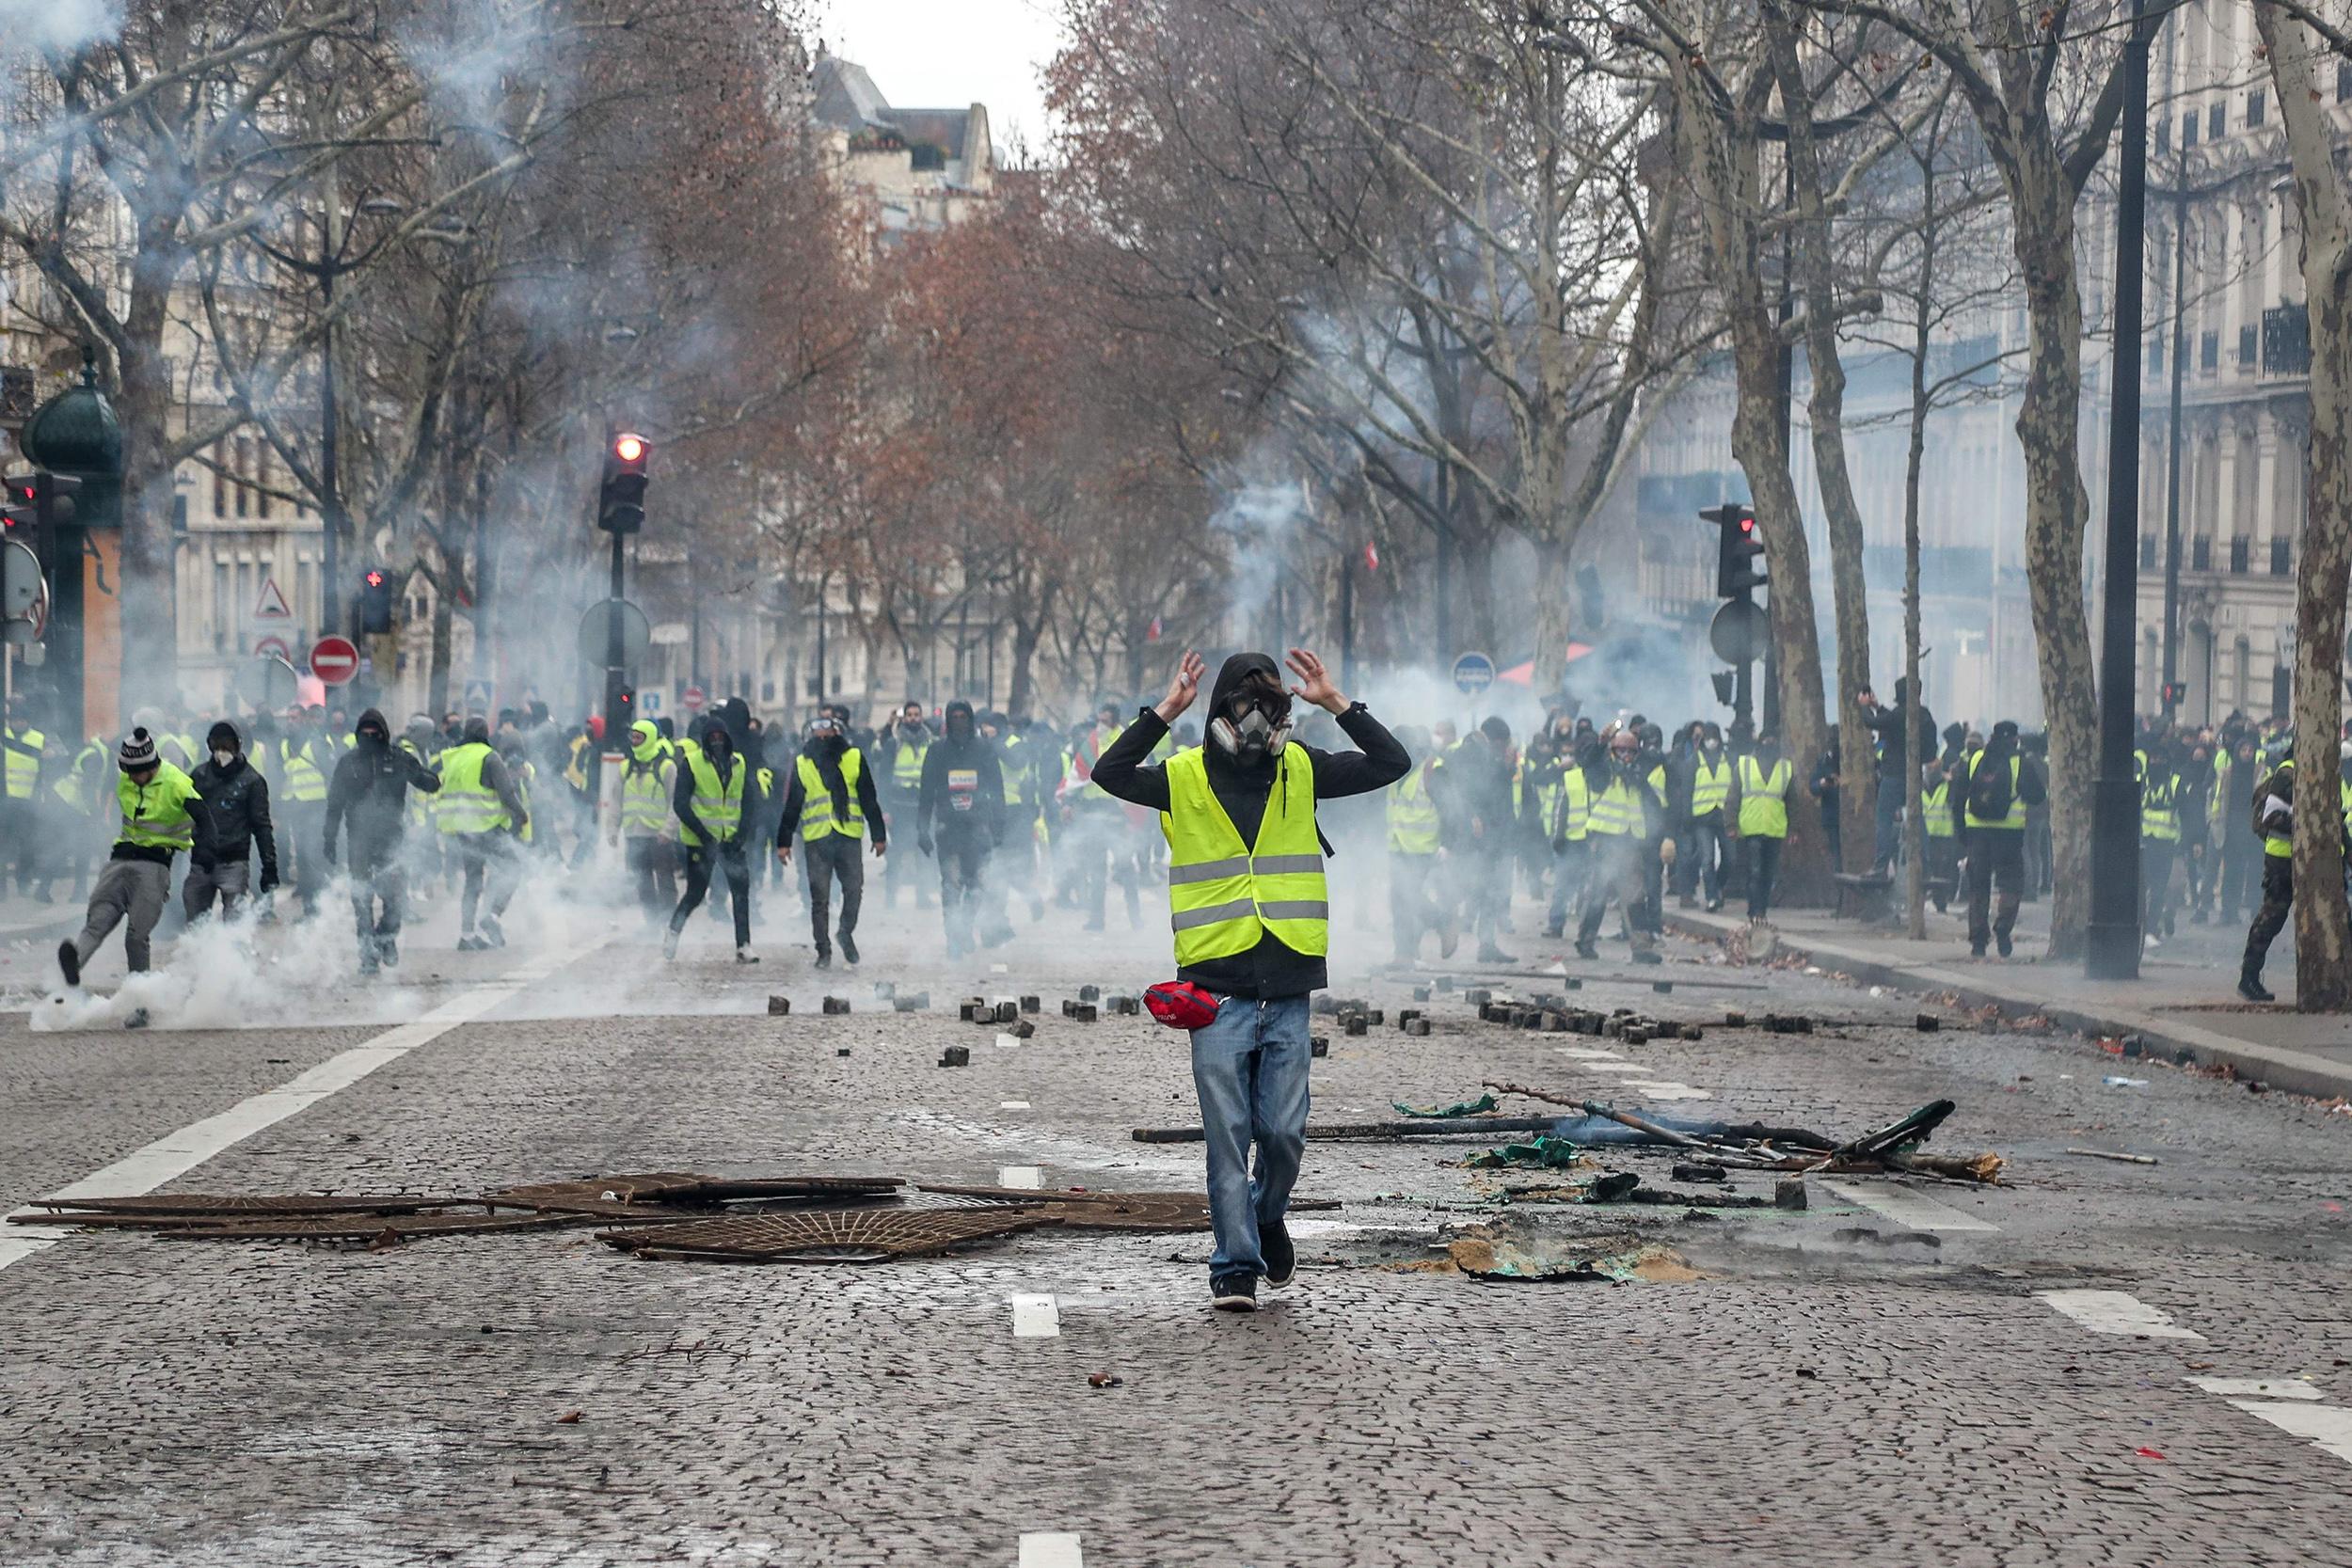 Paris protests open up rift on American left, spark U.S. climate change debate